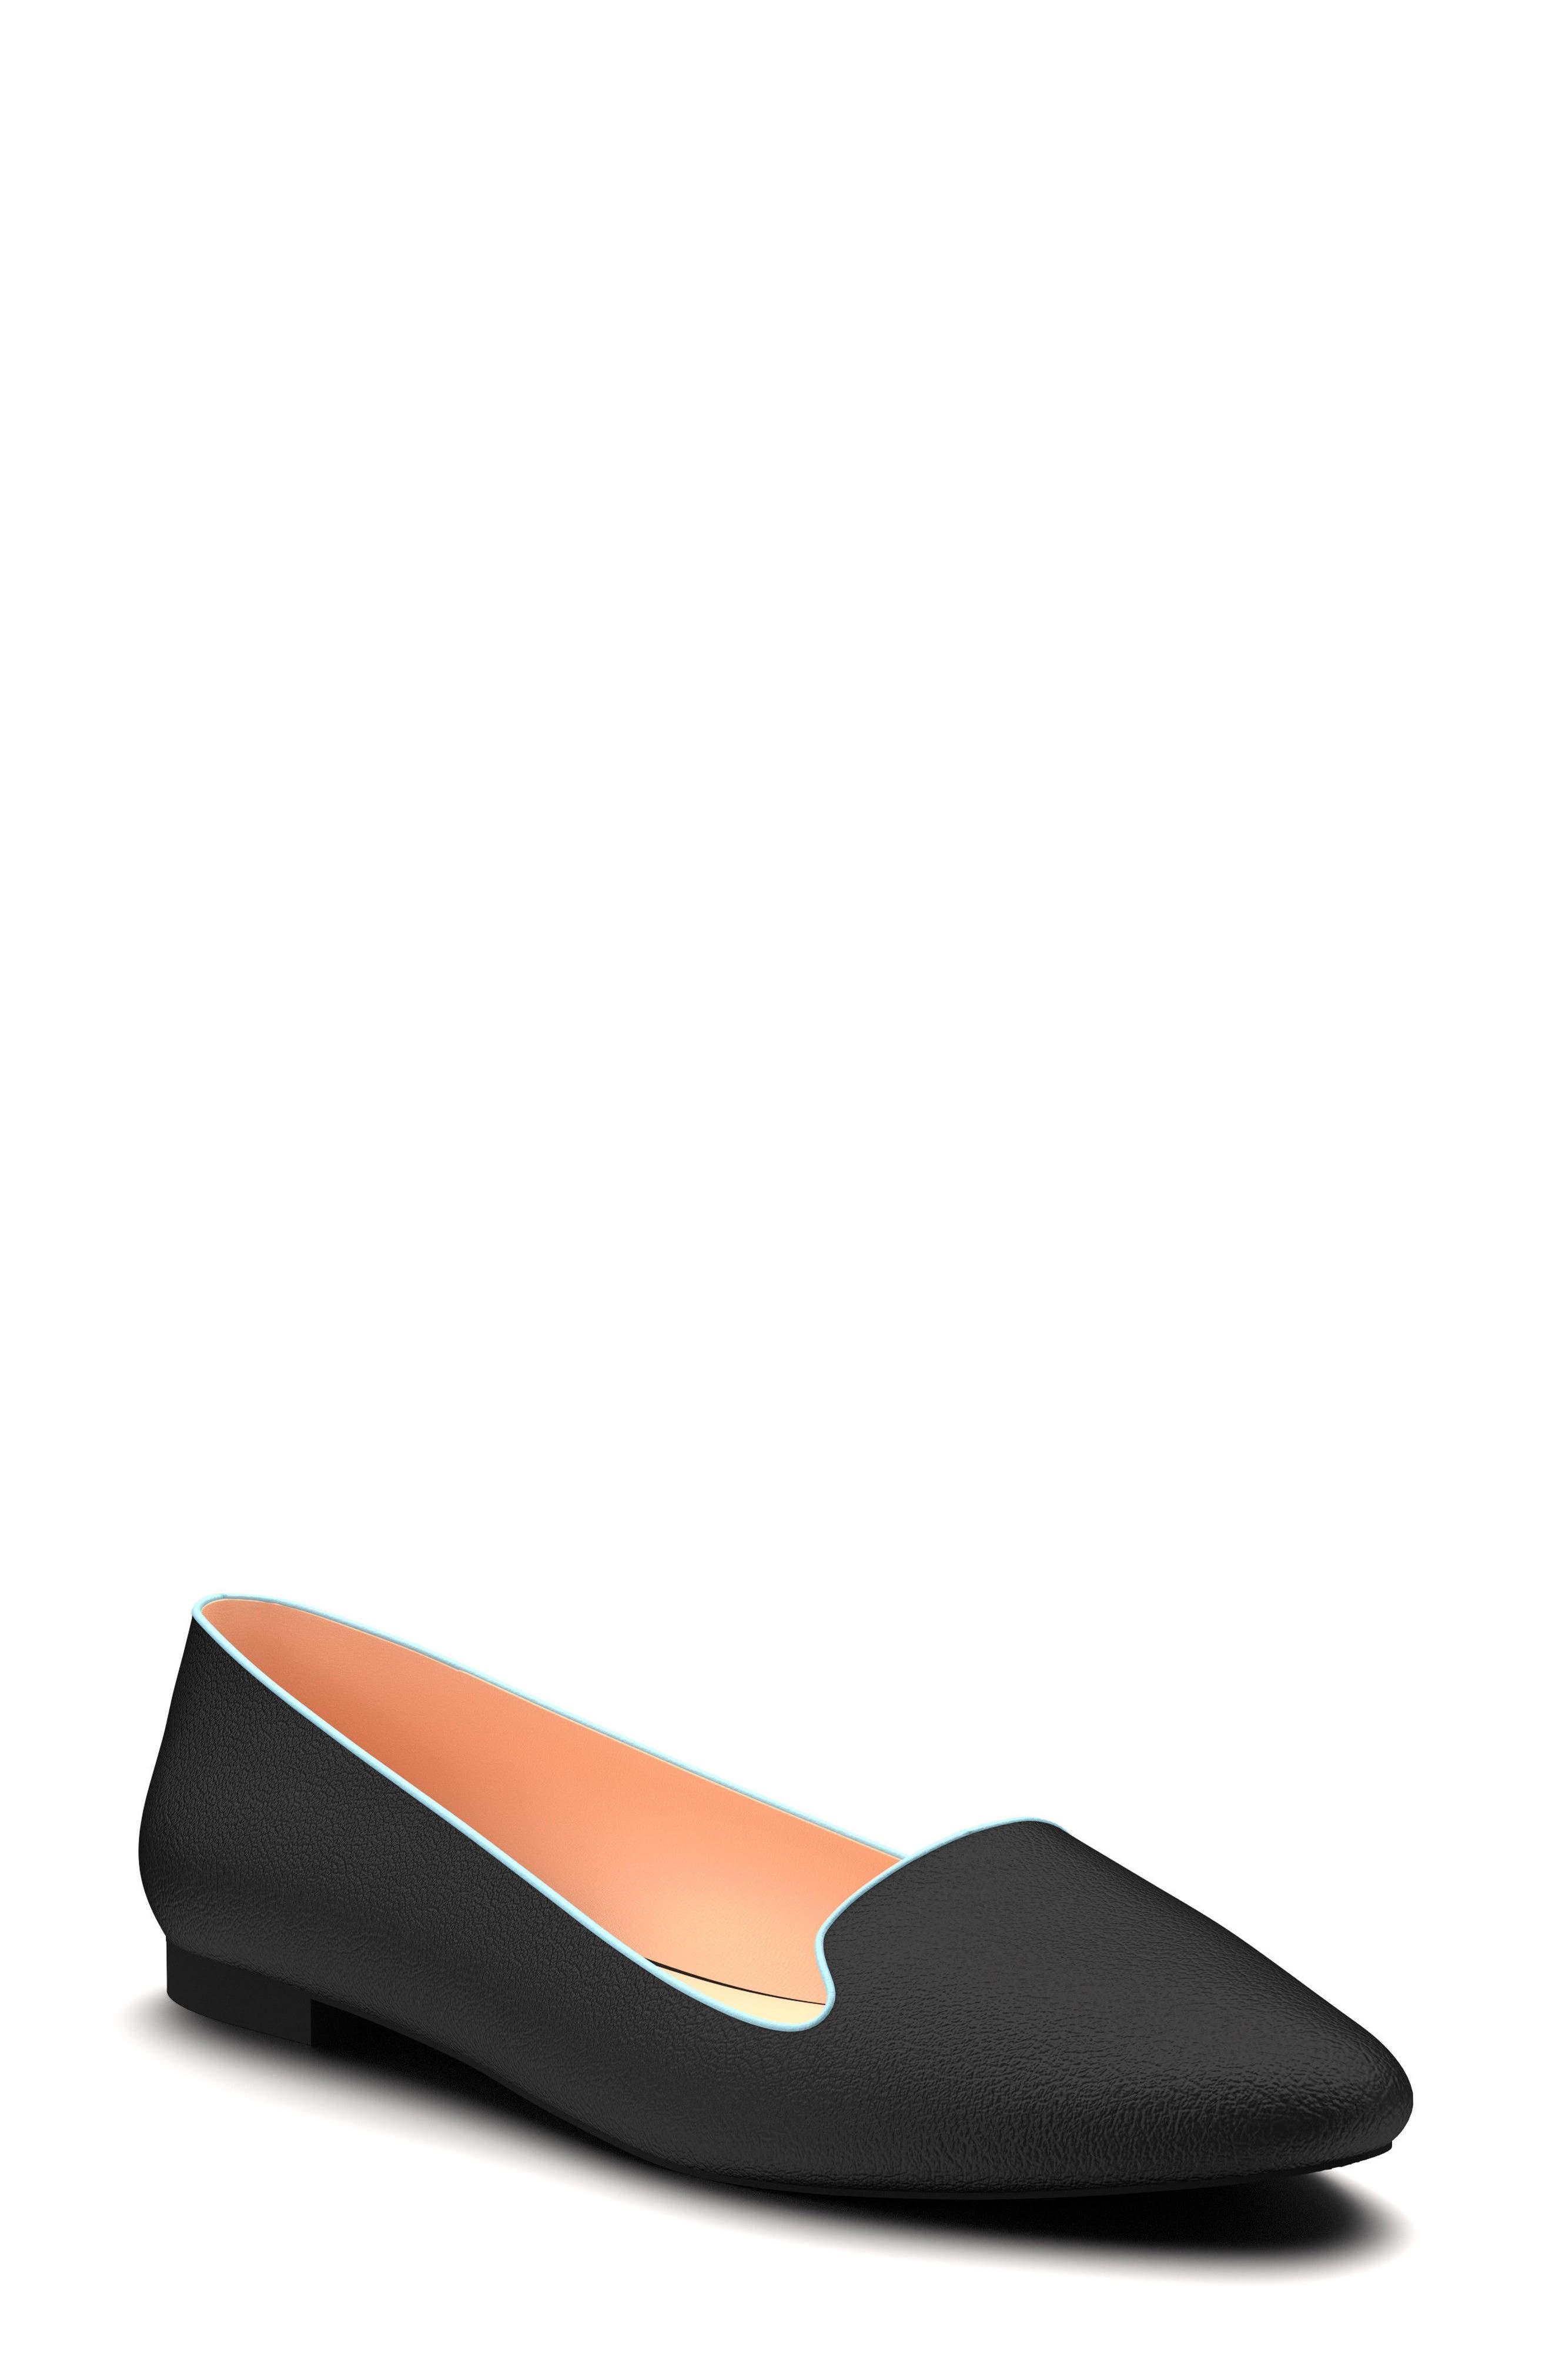 Shoes of Prey Smoking Slipper (Women)